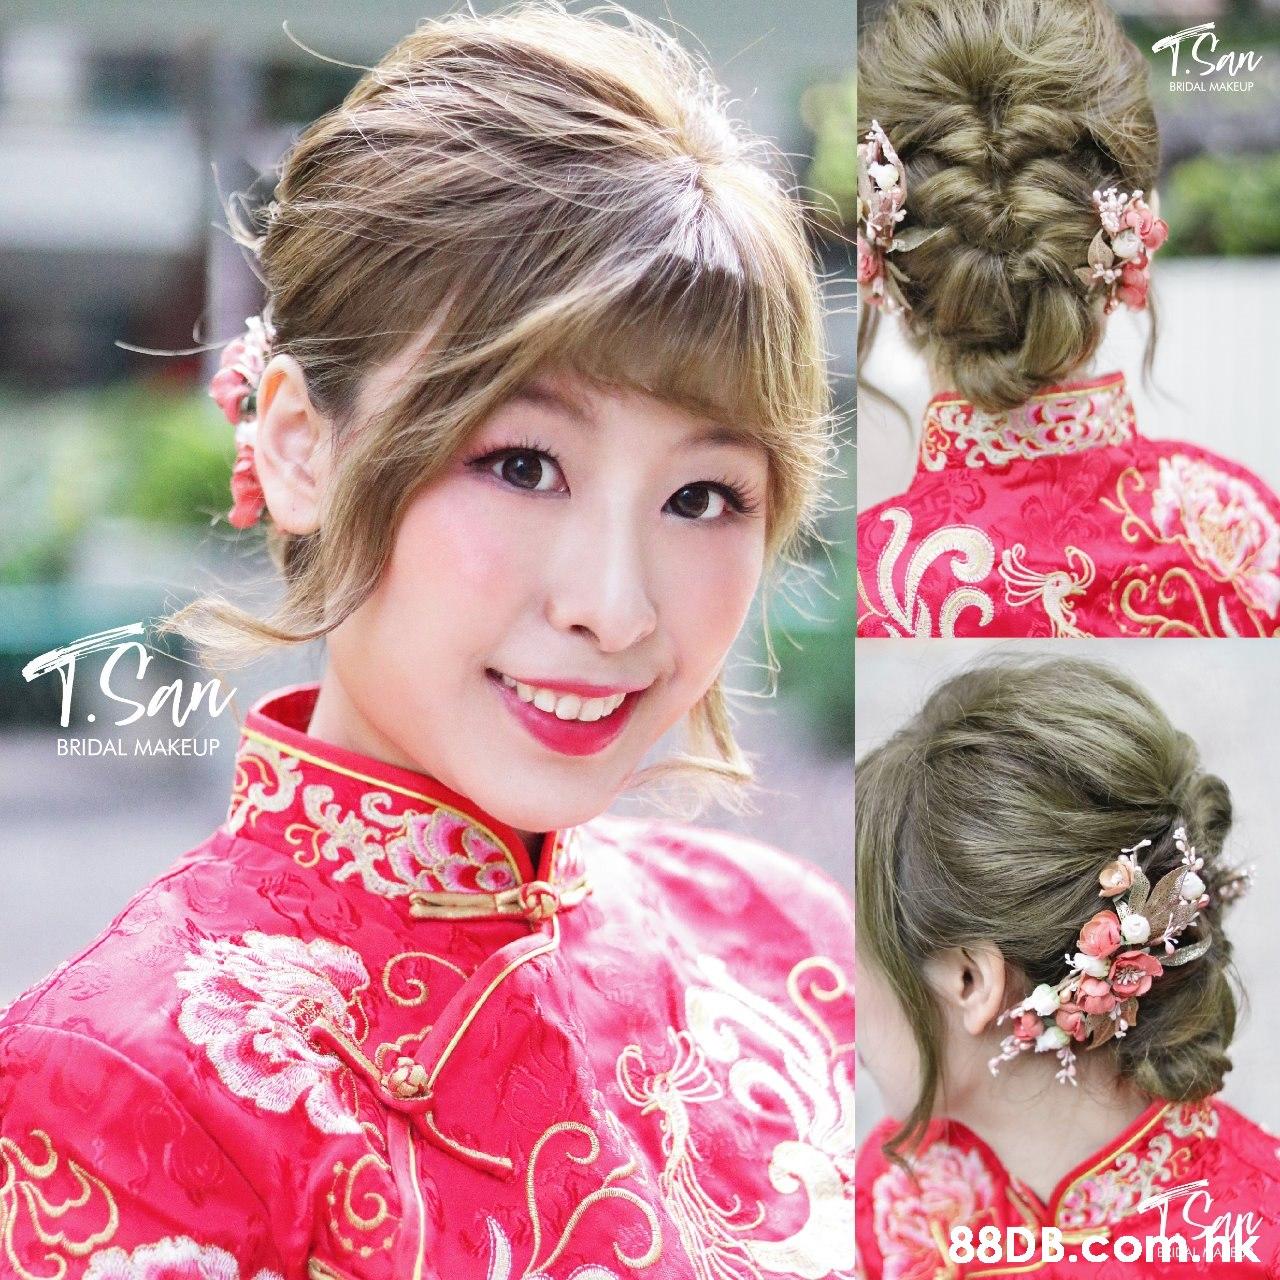 1San BRIDAL MAKEUP 1Sn BRIDAL MAKEUP 88DB.Com.hK  Hair,Hairstyle,Head,Chignon,Chin